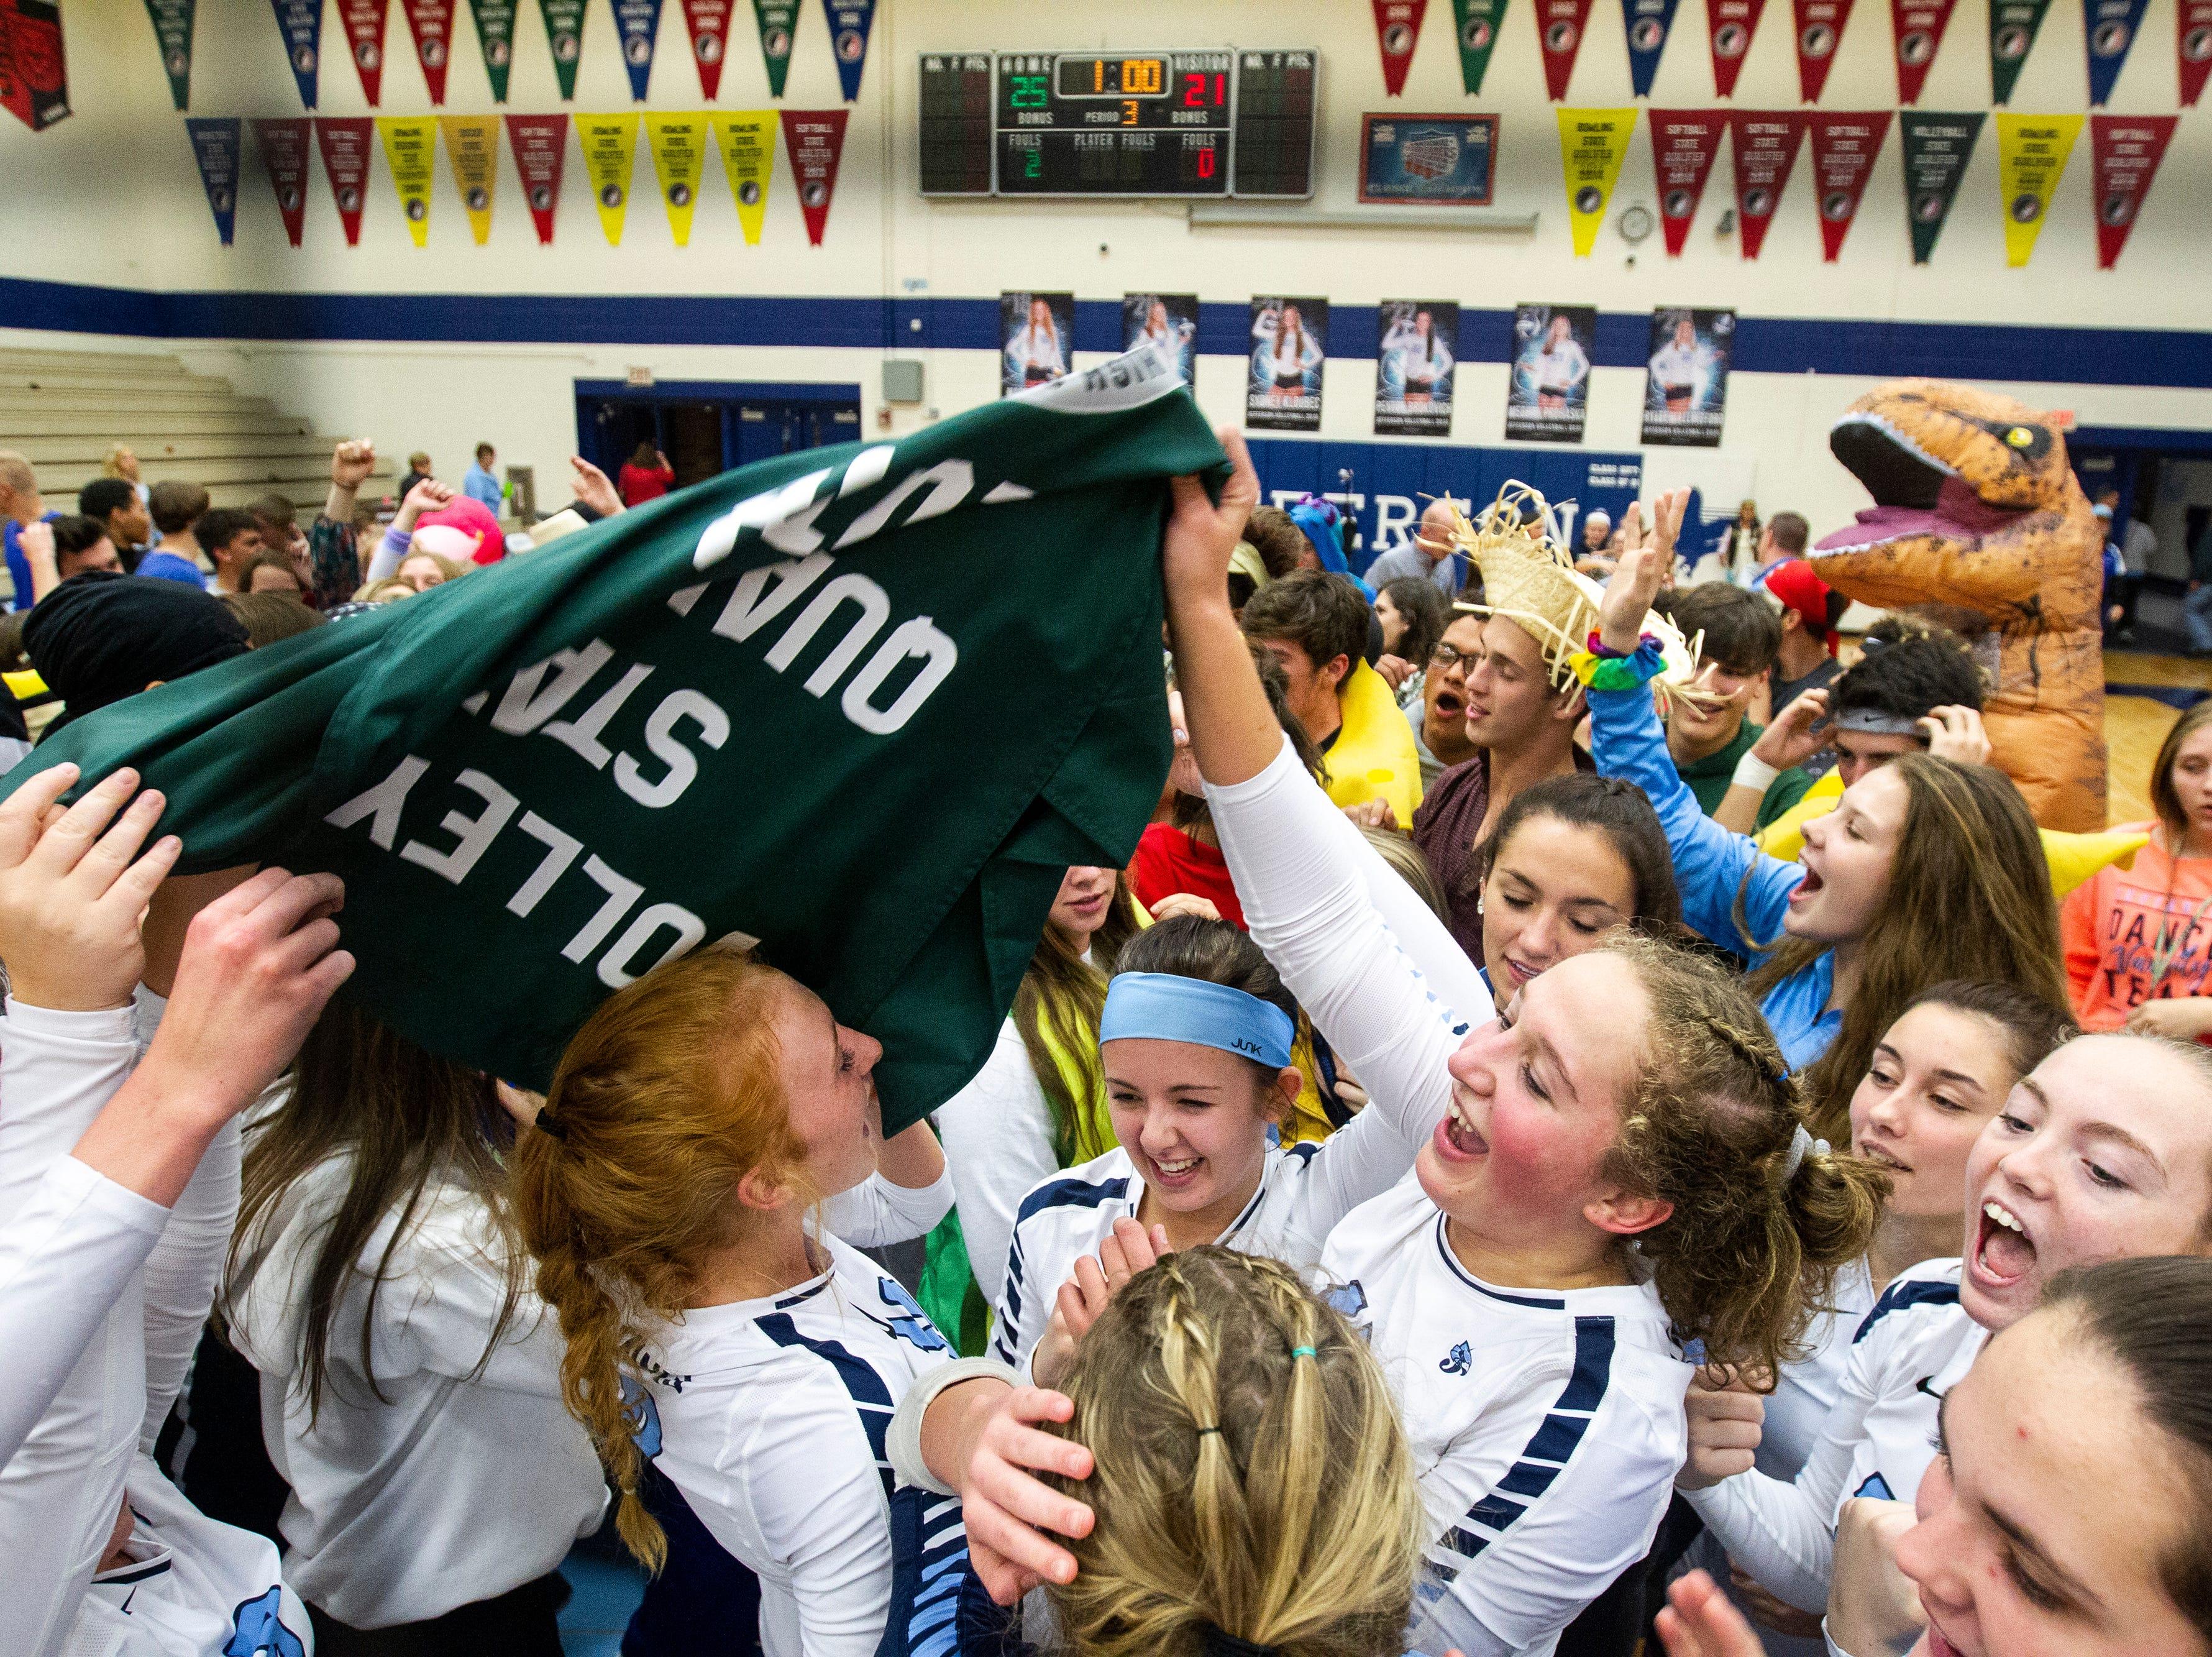 Cedar Rapids Jefferson players celebrate after a Class 5A volleyball regional final game on Monday, Oct. 29, 2018, at Jefferson High School in Cedar Rapids.